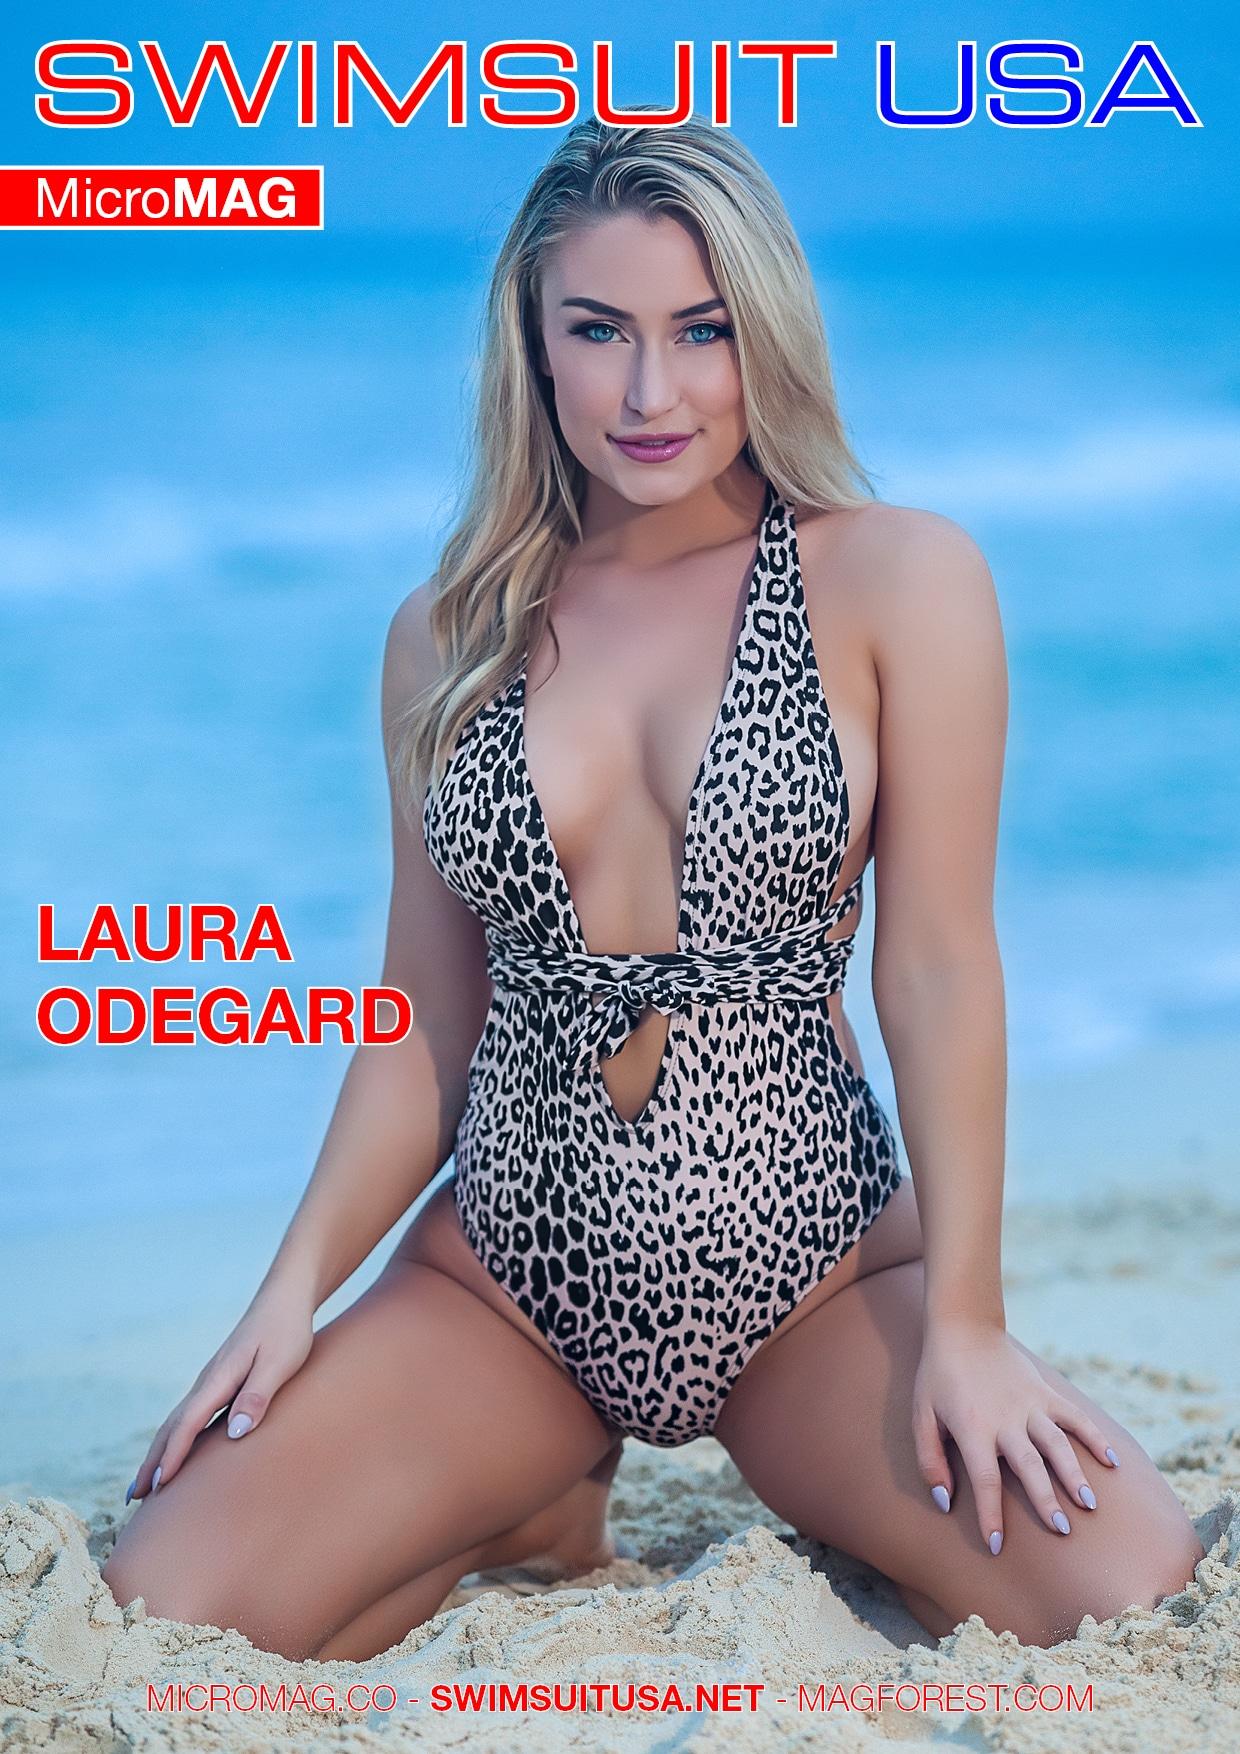 Swimsuit USA MicroMAG - Laura Odegard